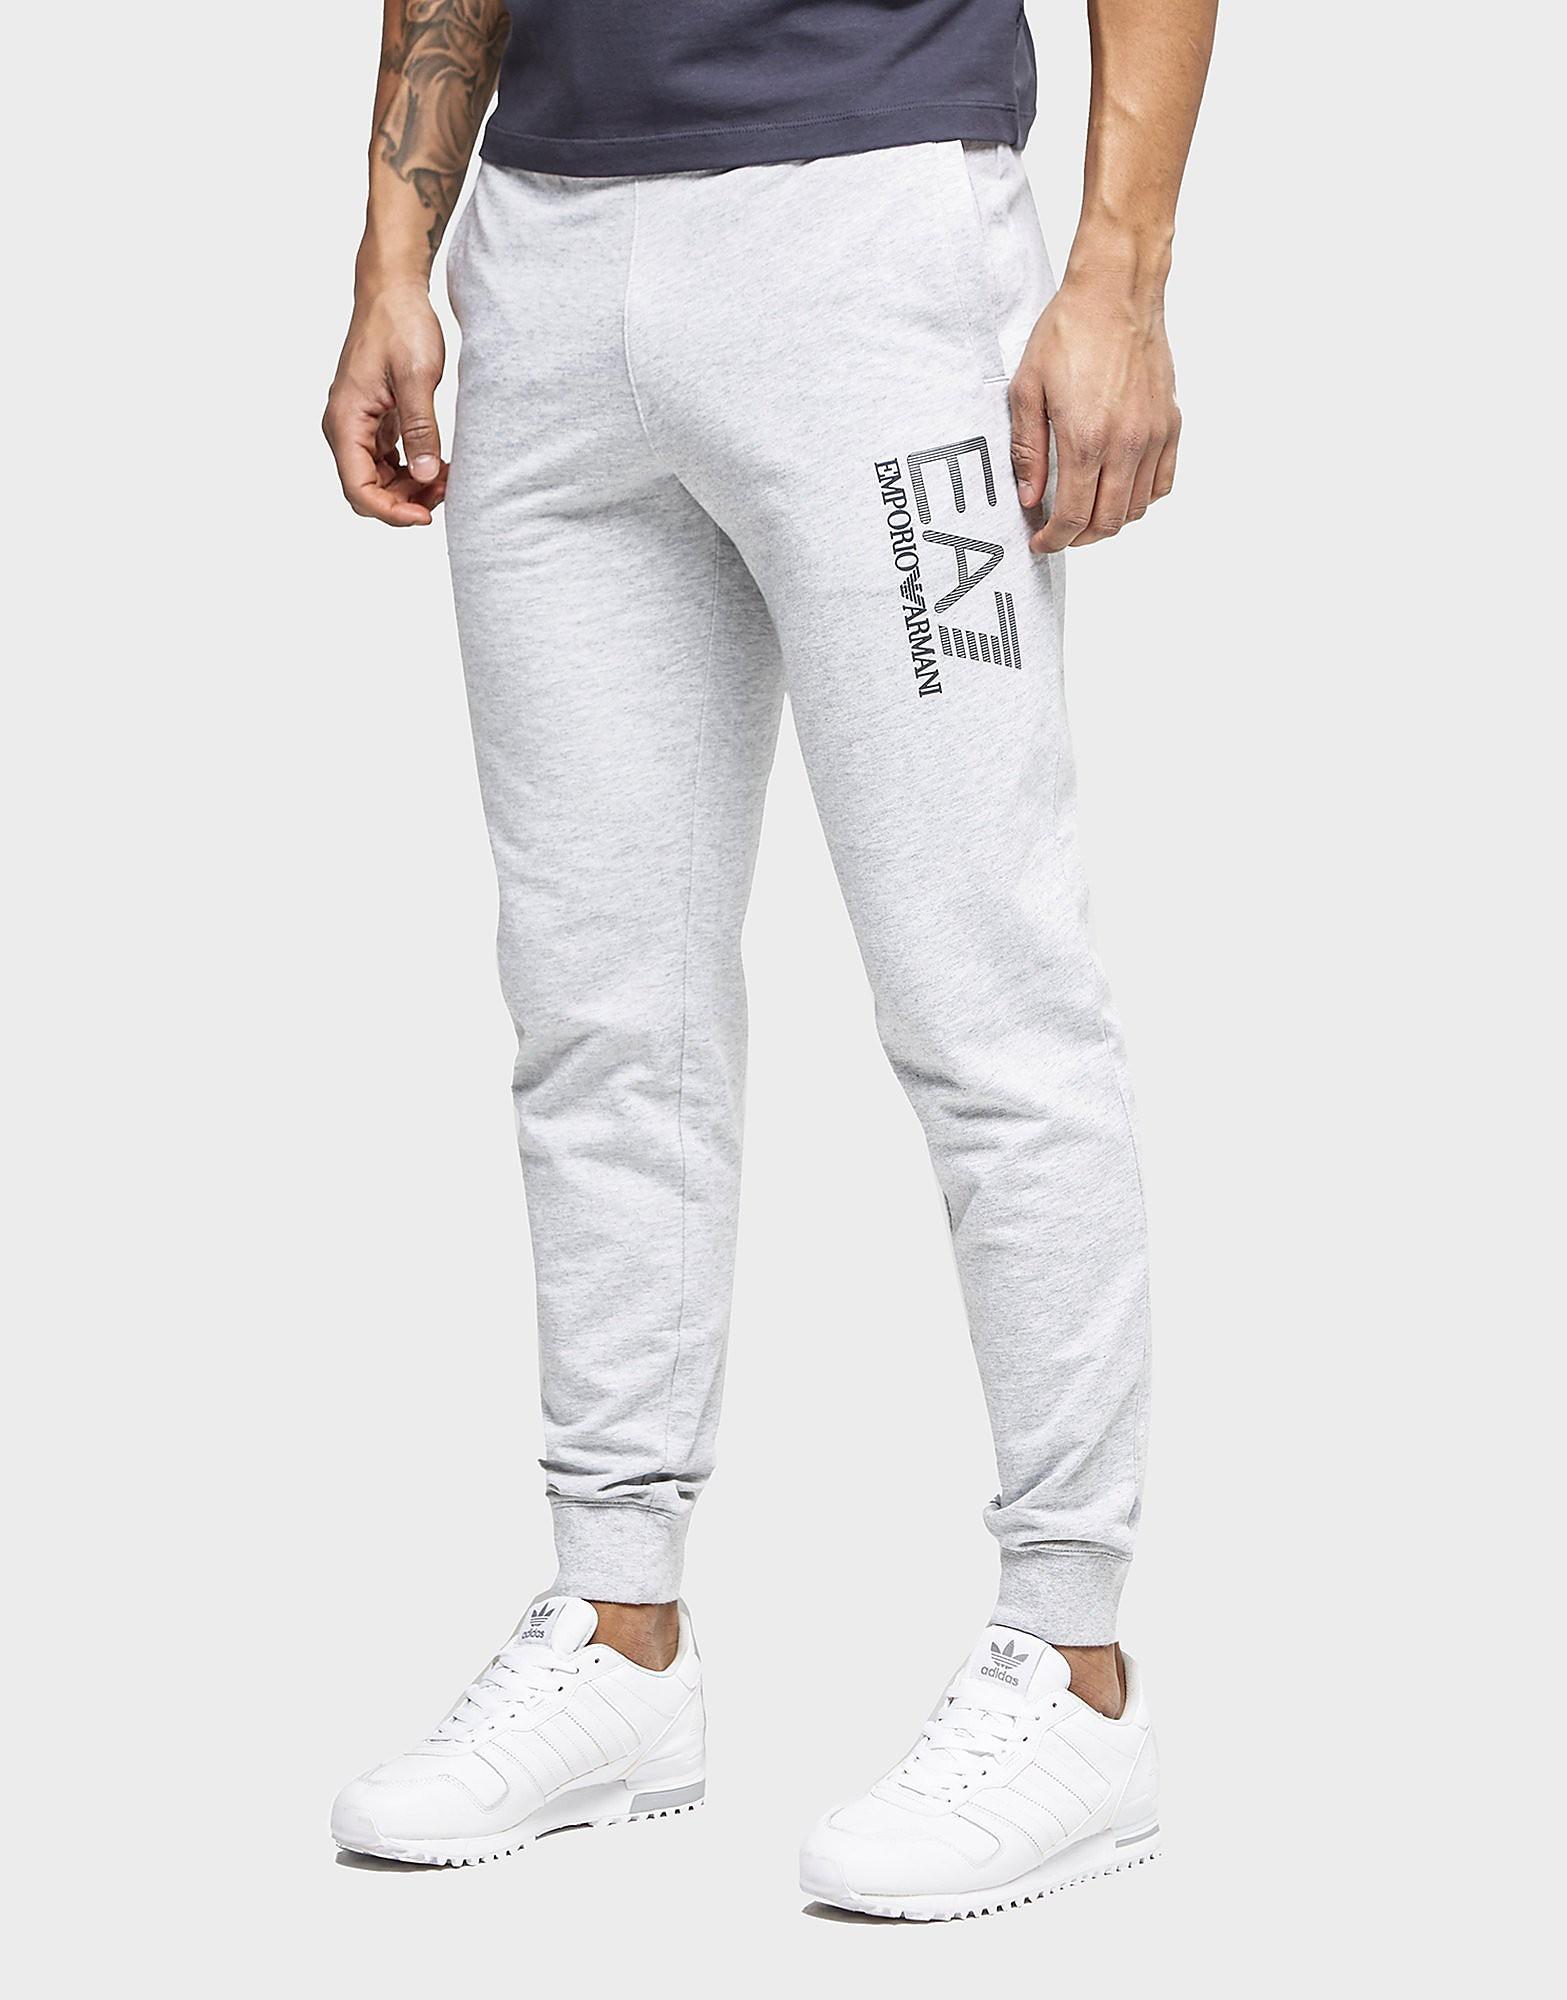 Emporio Armani EA7 VIZ Cuff Track Pants